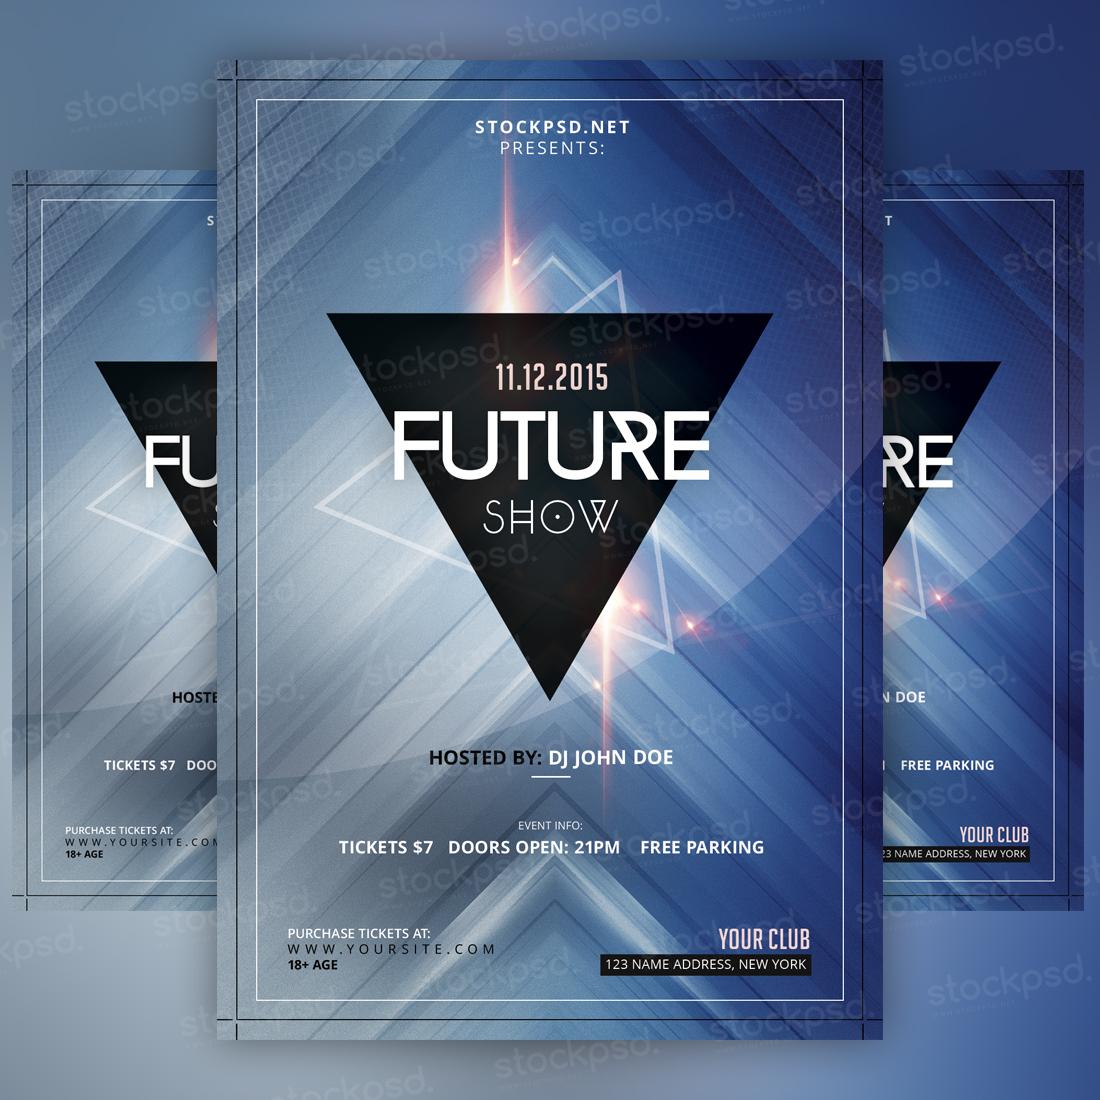 Future Show – PSD Minimal Freebie Flyer